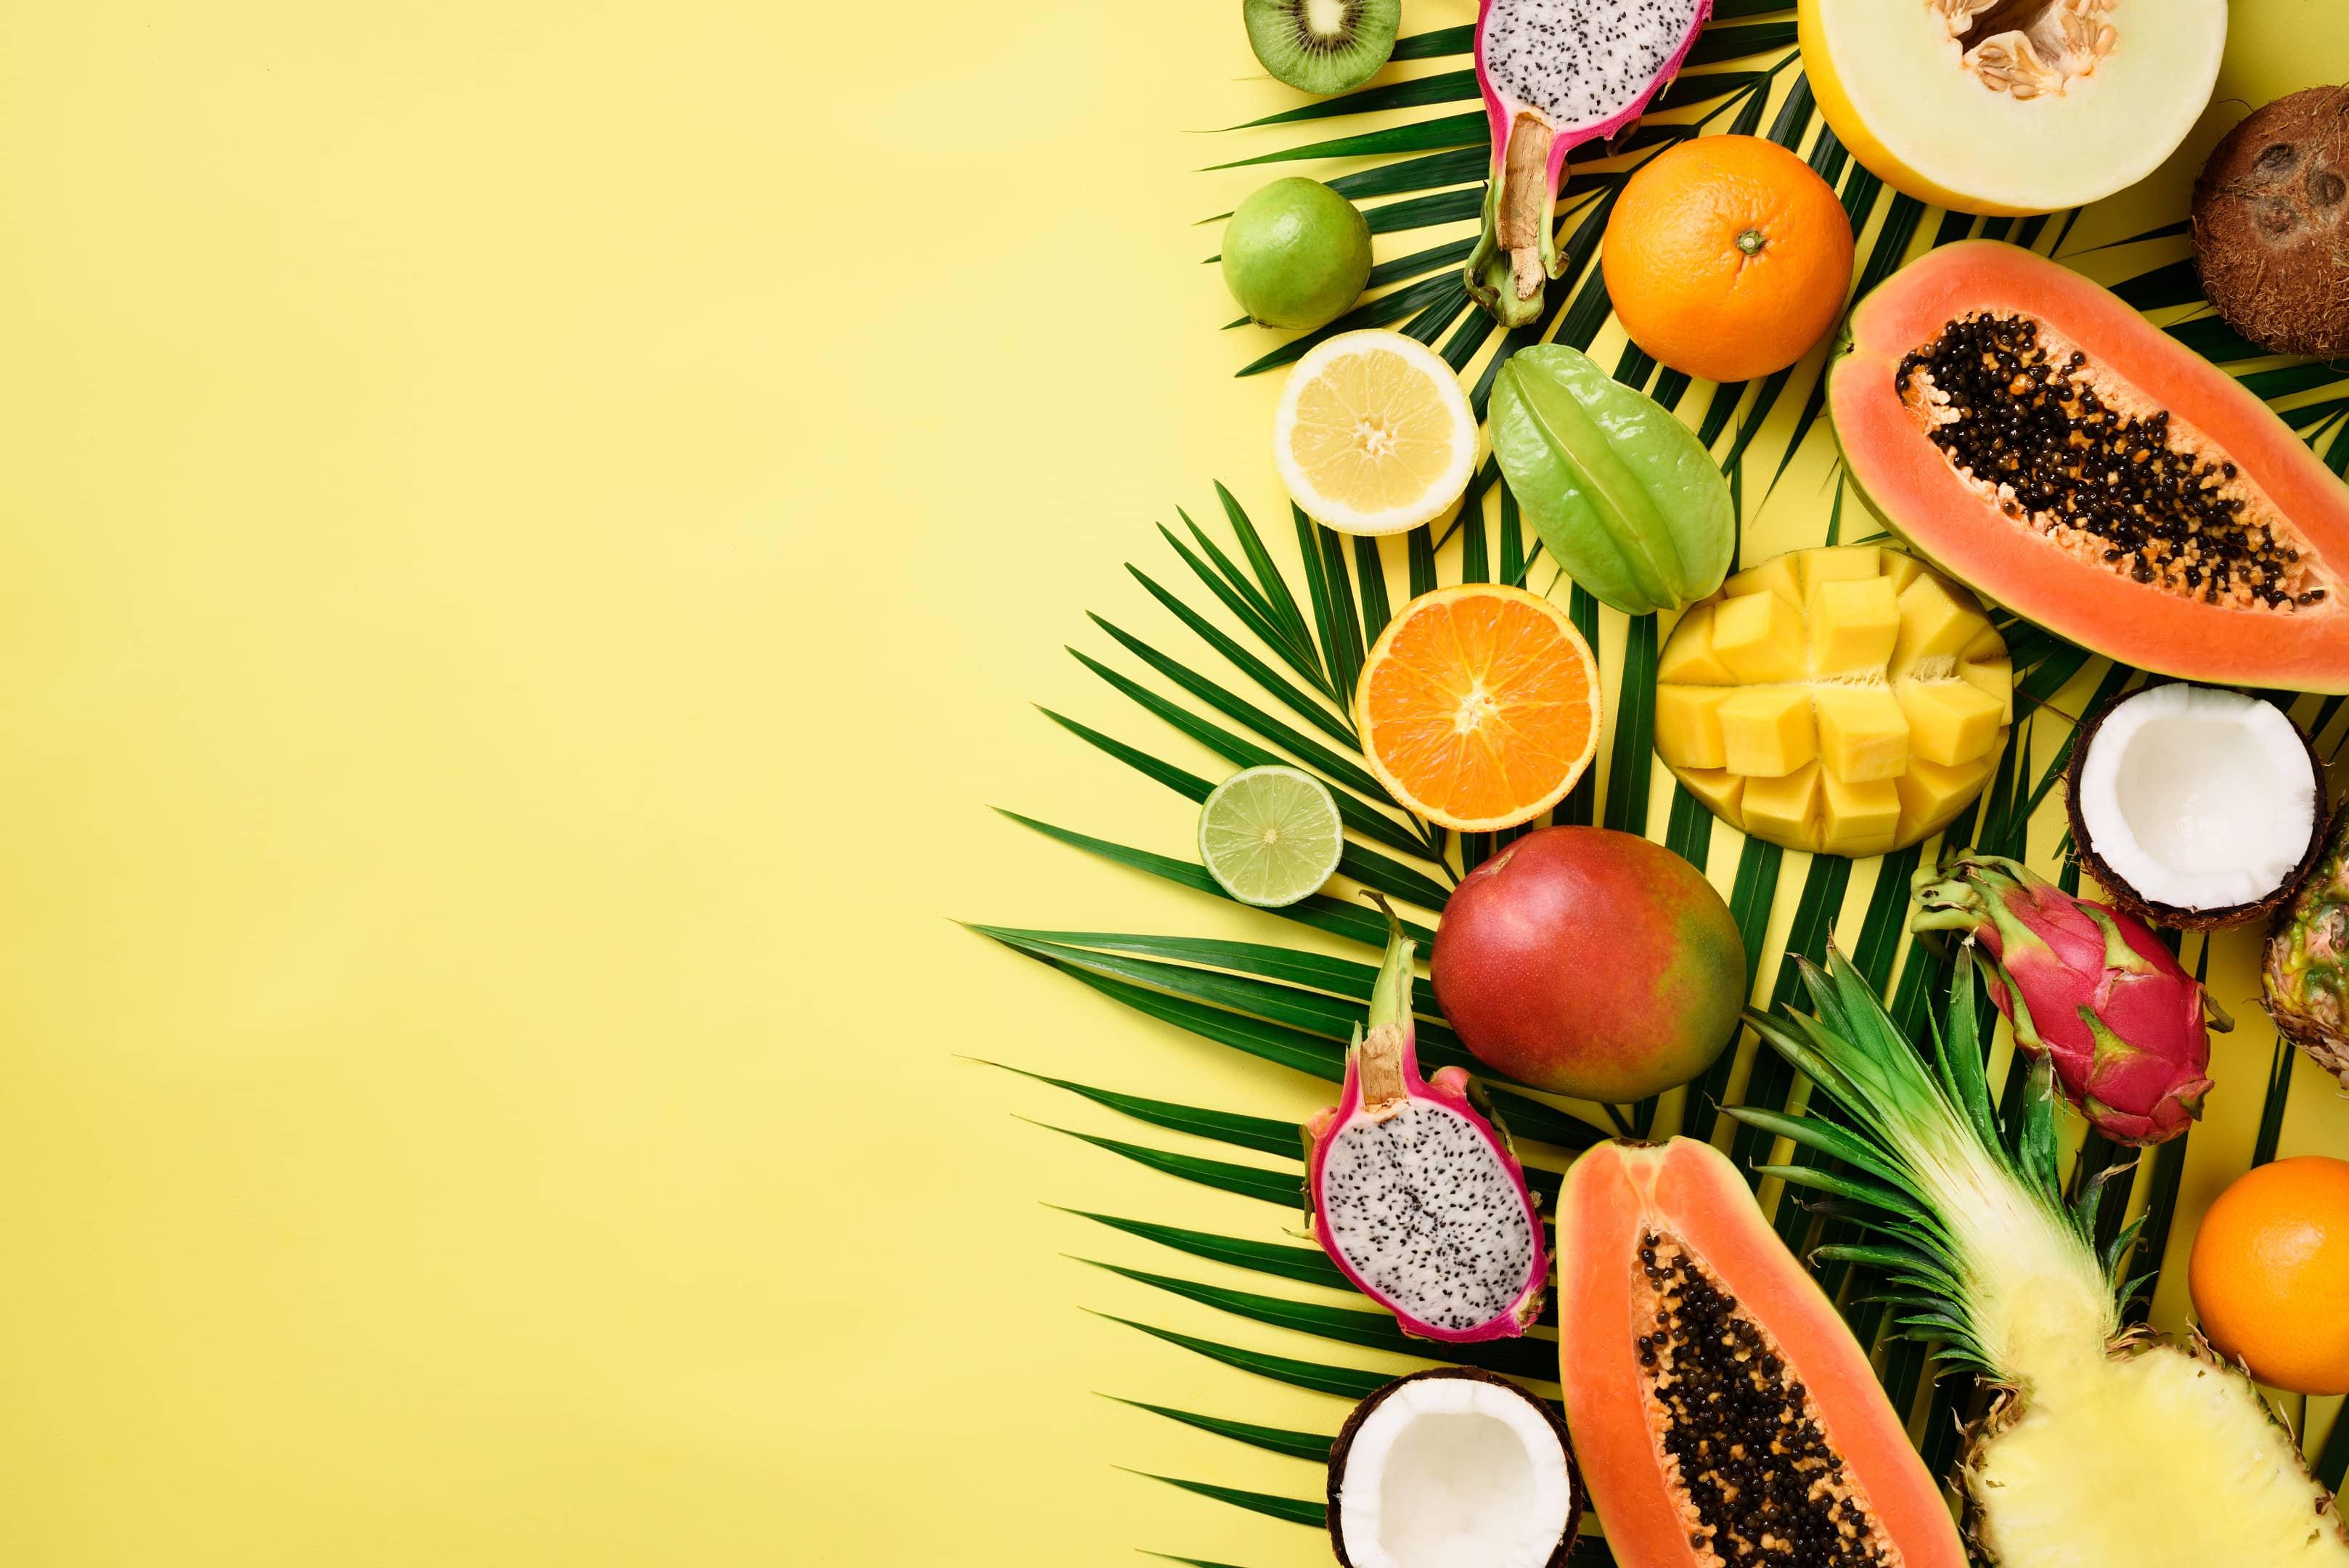 Tropical fruits — papaya, mango, pineapple, carambola, dragon fruit, kiwi, lemon, orange, melon, coconut and lime